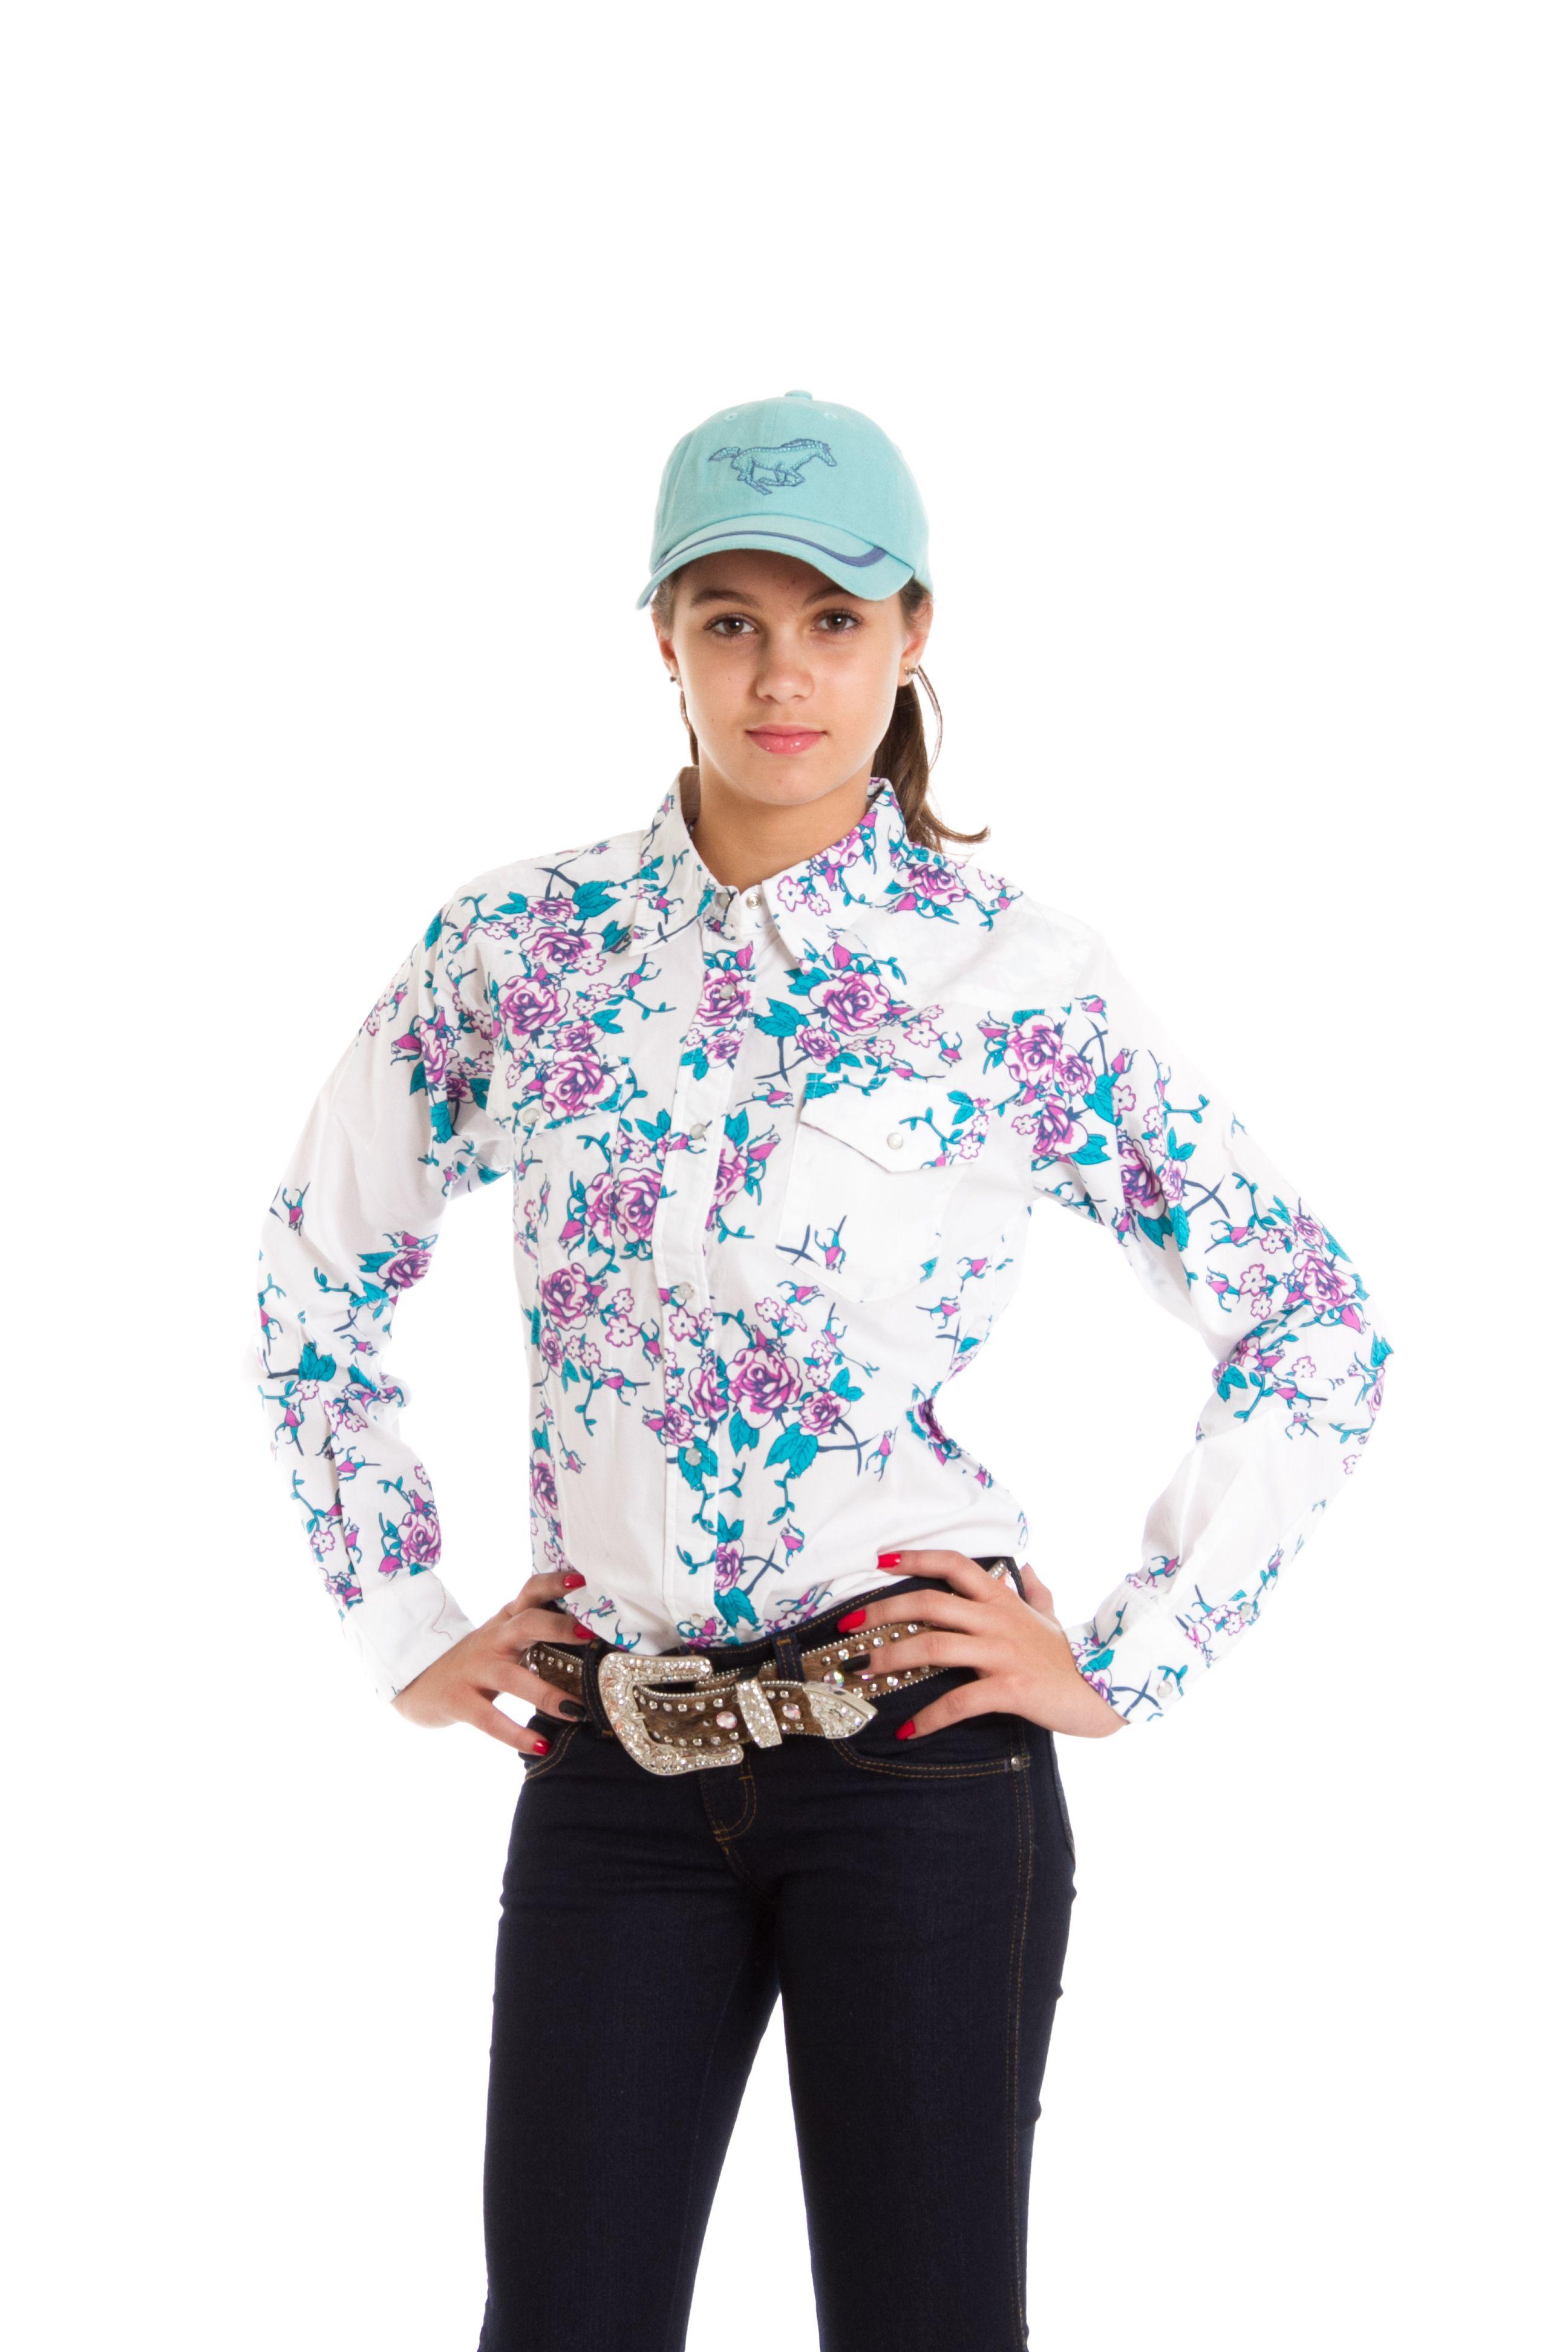 7c2e8386d1 Camisa Floral Juvenil Manga Longa camisa manga longa feminina juvenil na  cor branca com estampa de